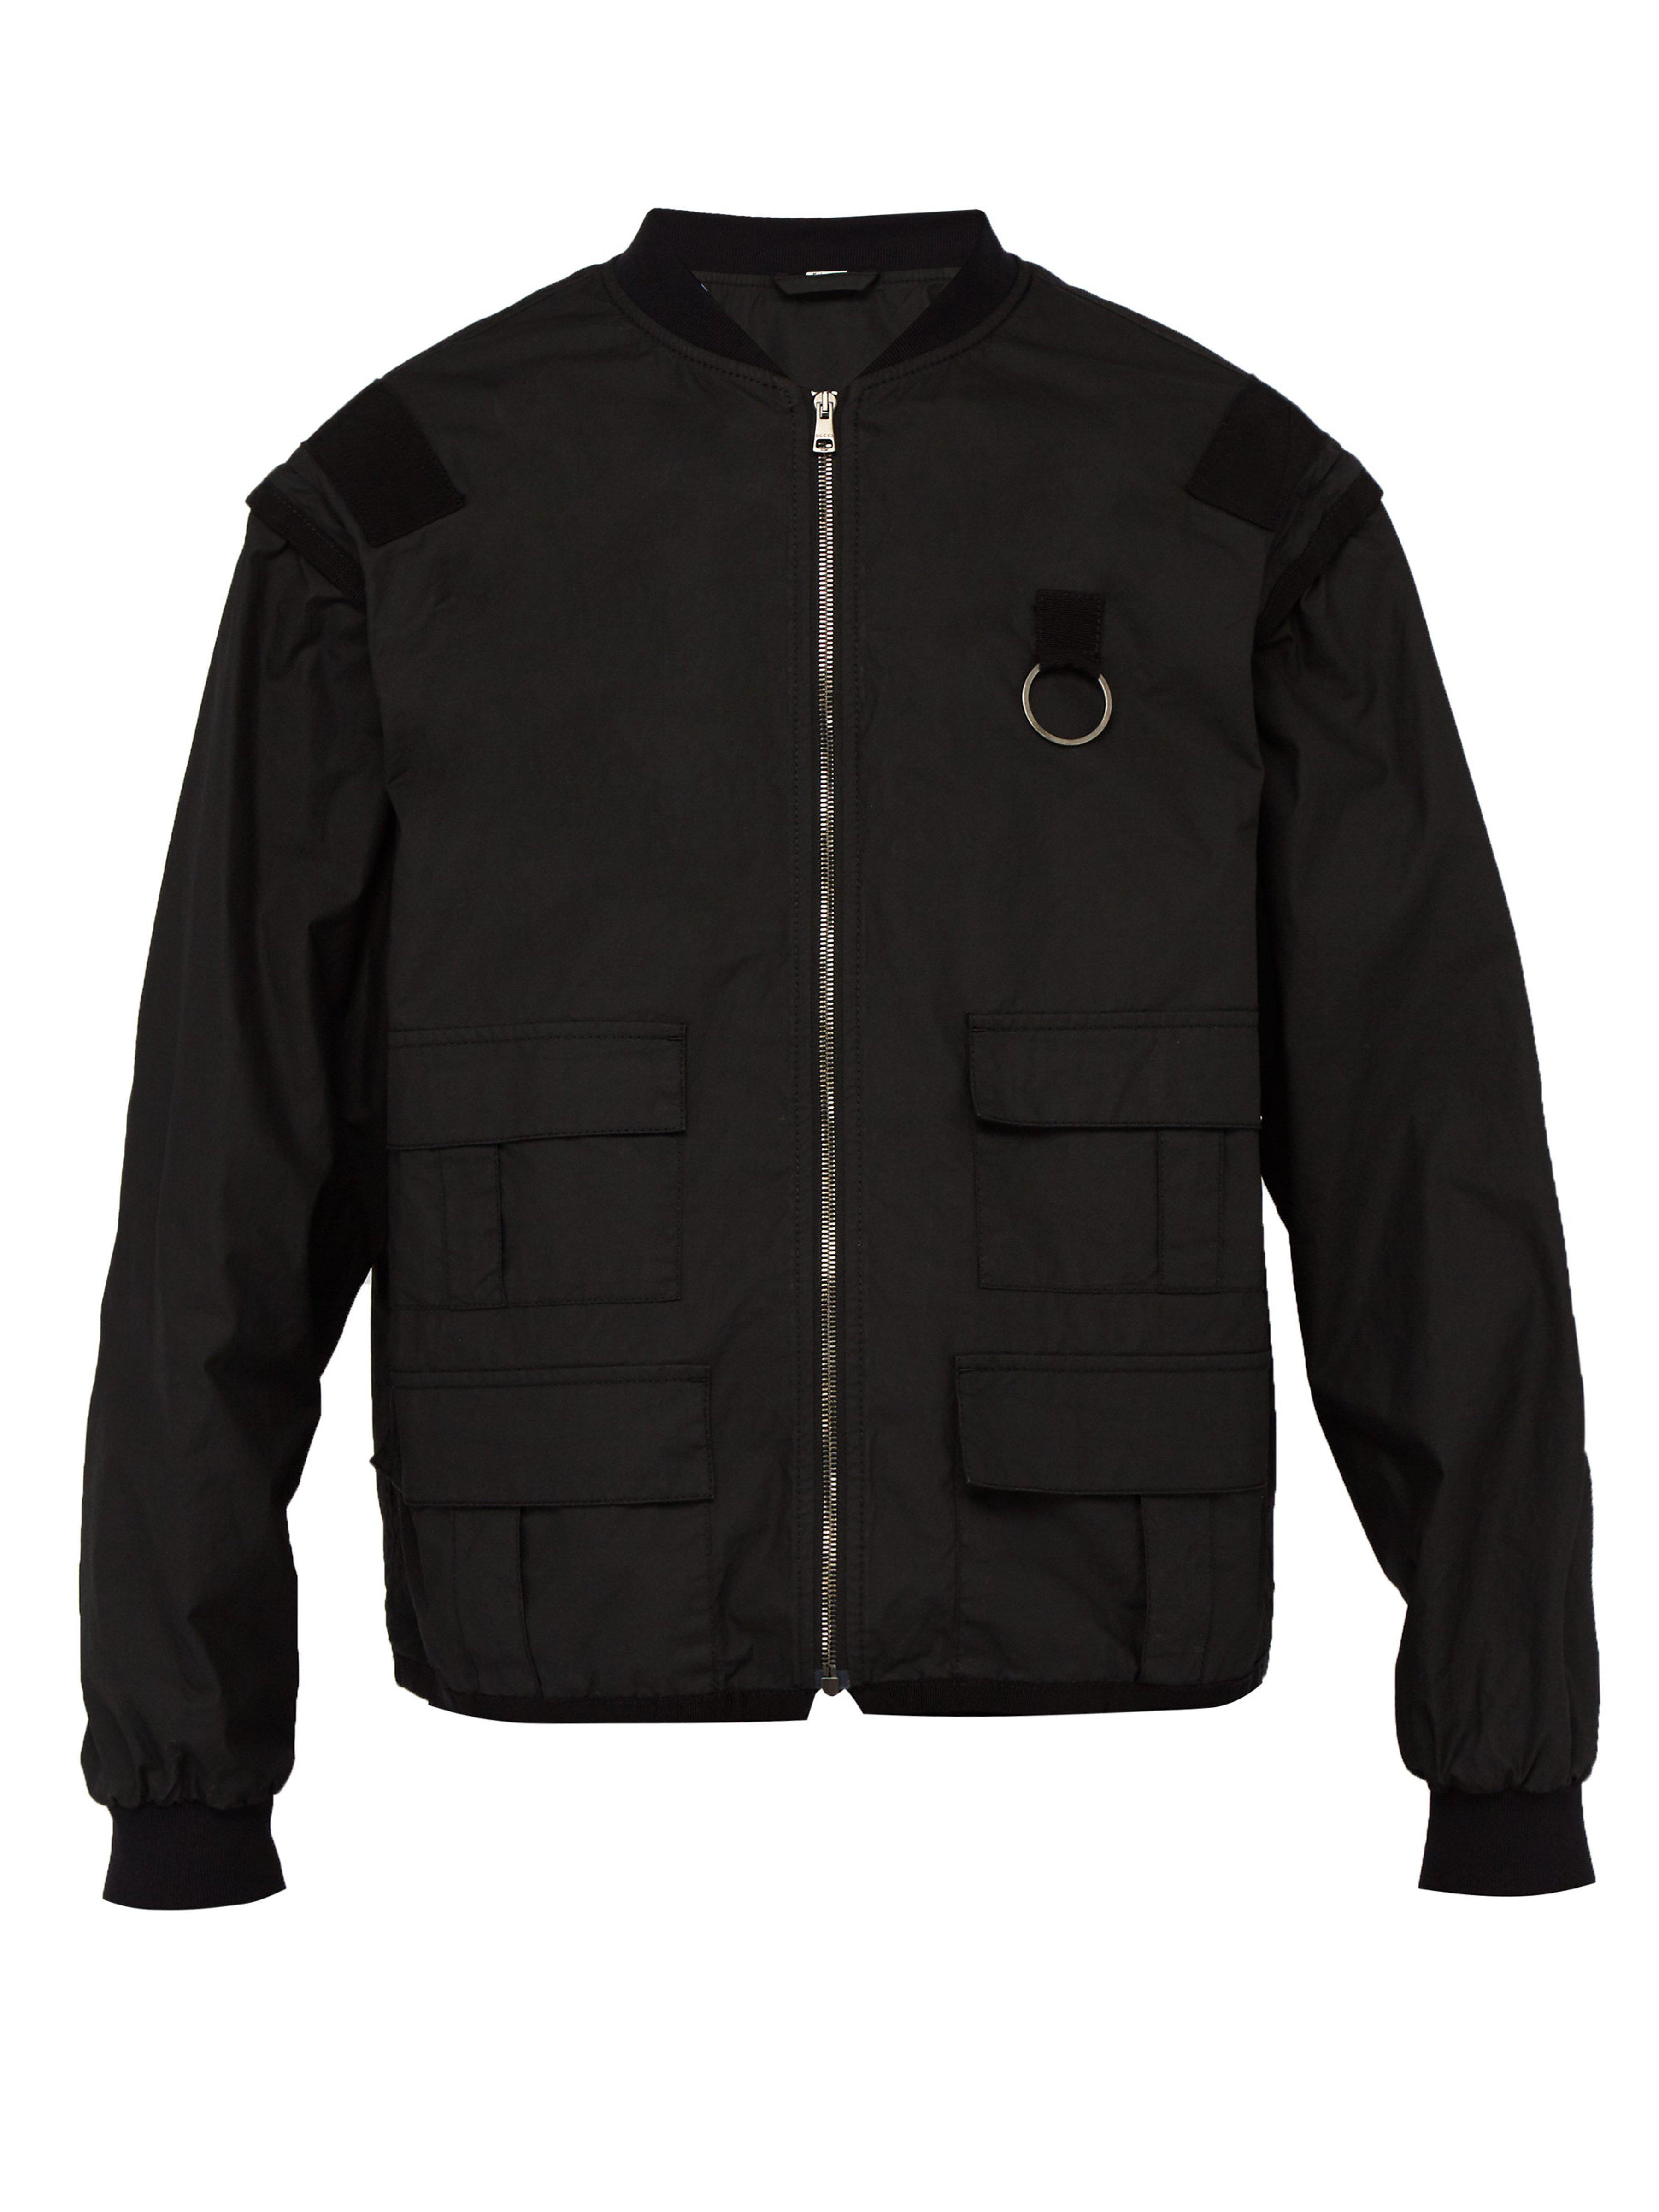 3b3a1cc5a Gucci Logo Print Detachable Sleeve Cotton Jacket in Black for Men - Lyst